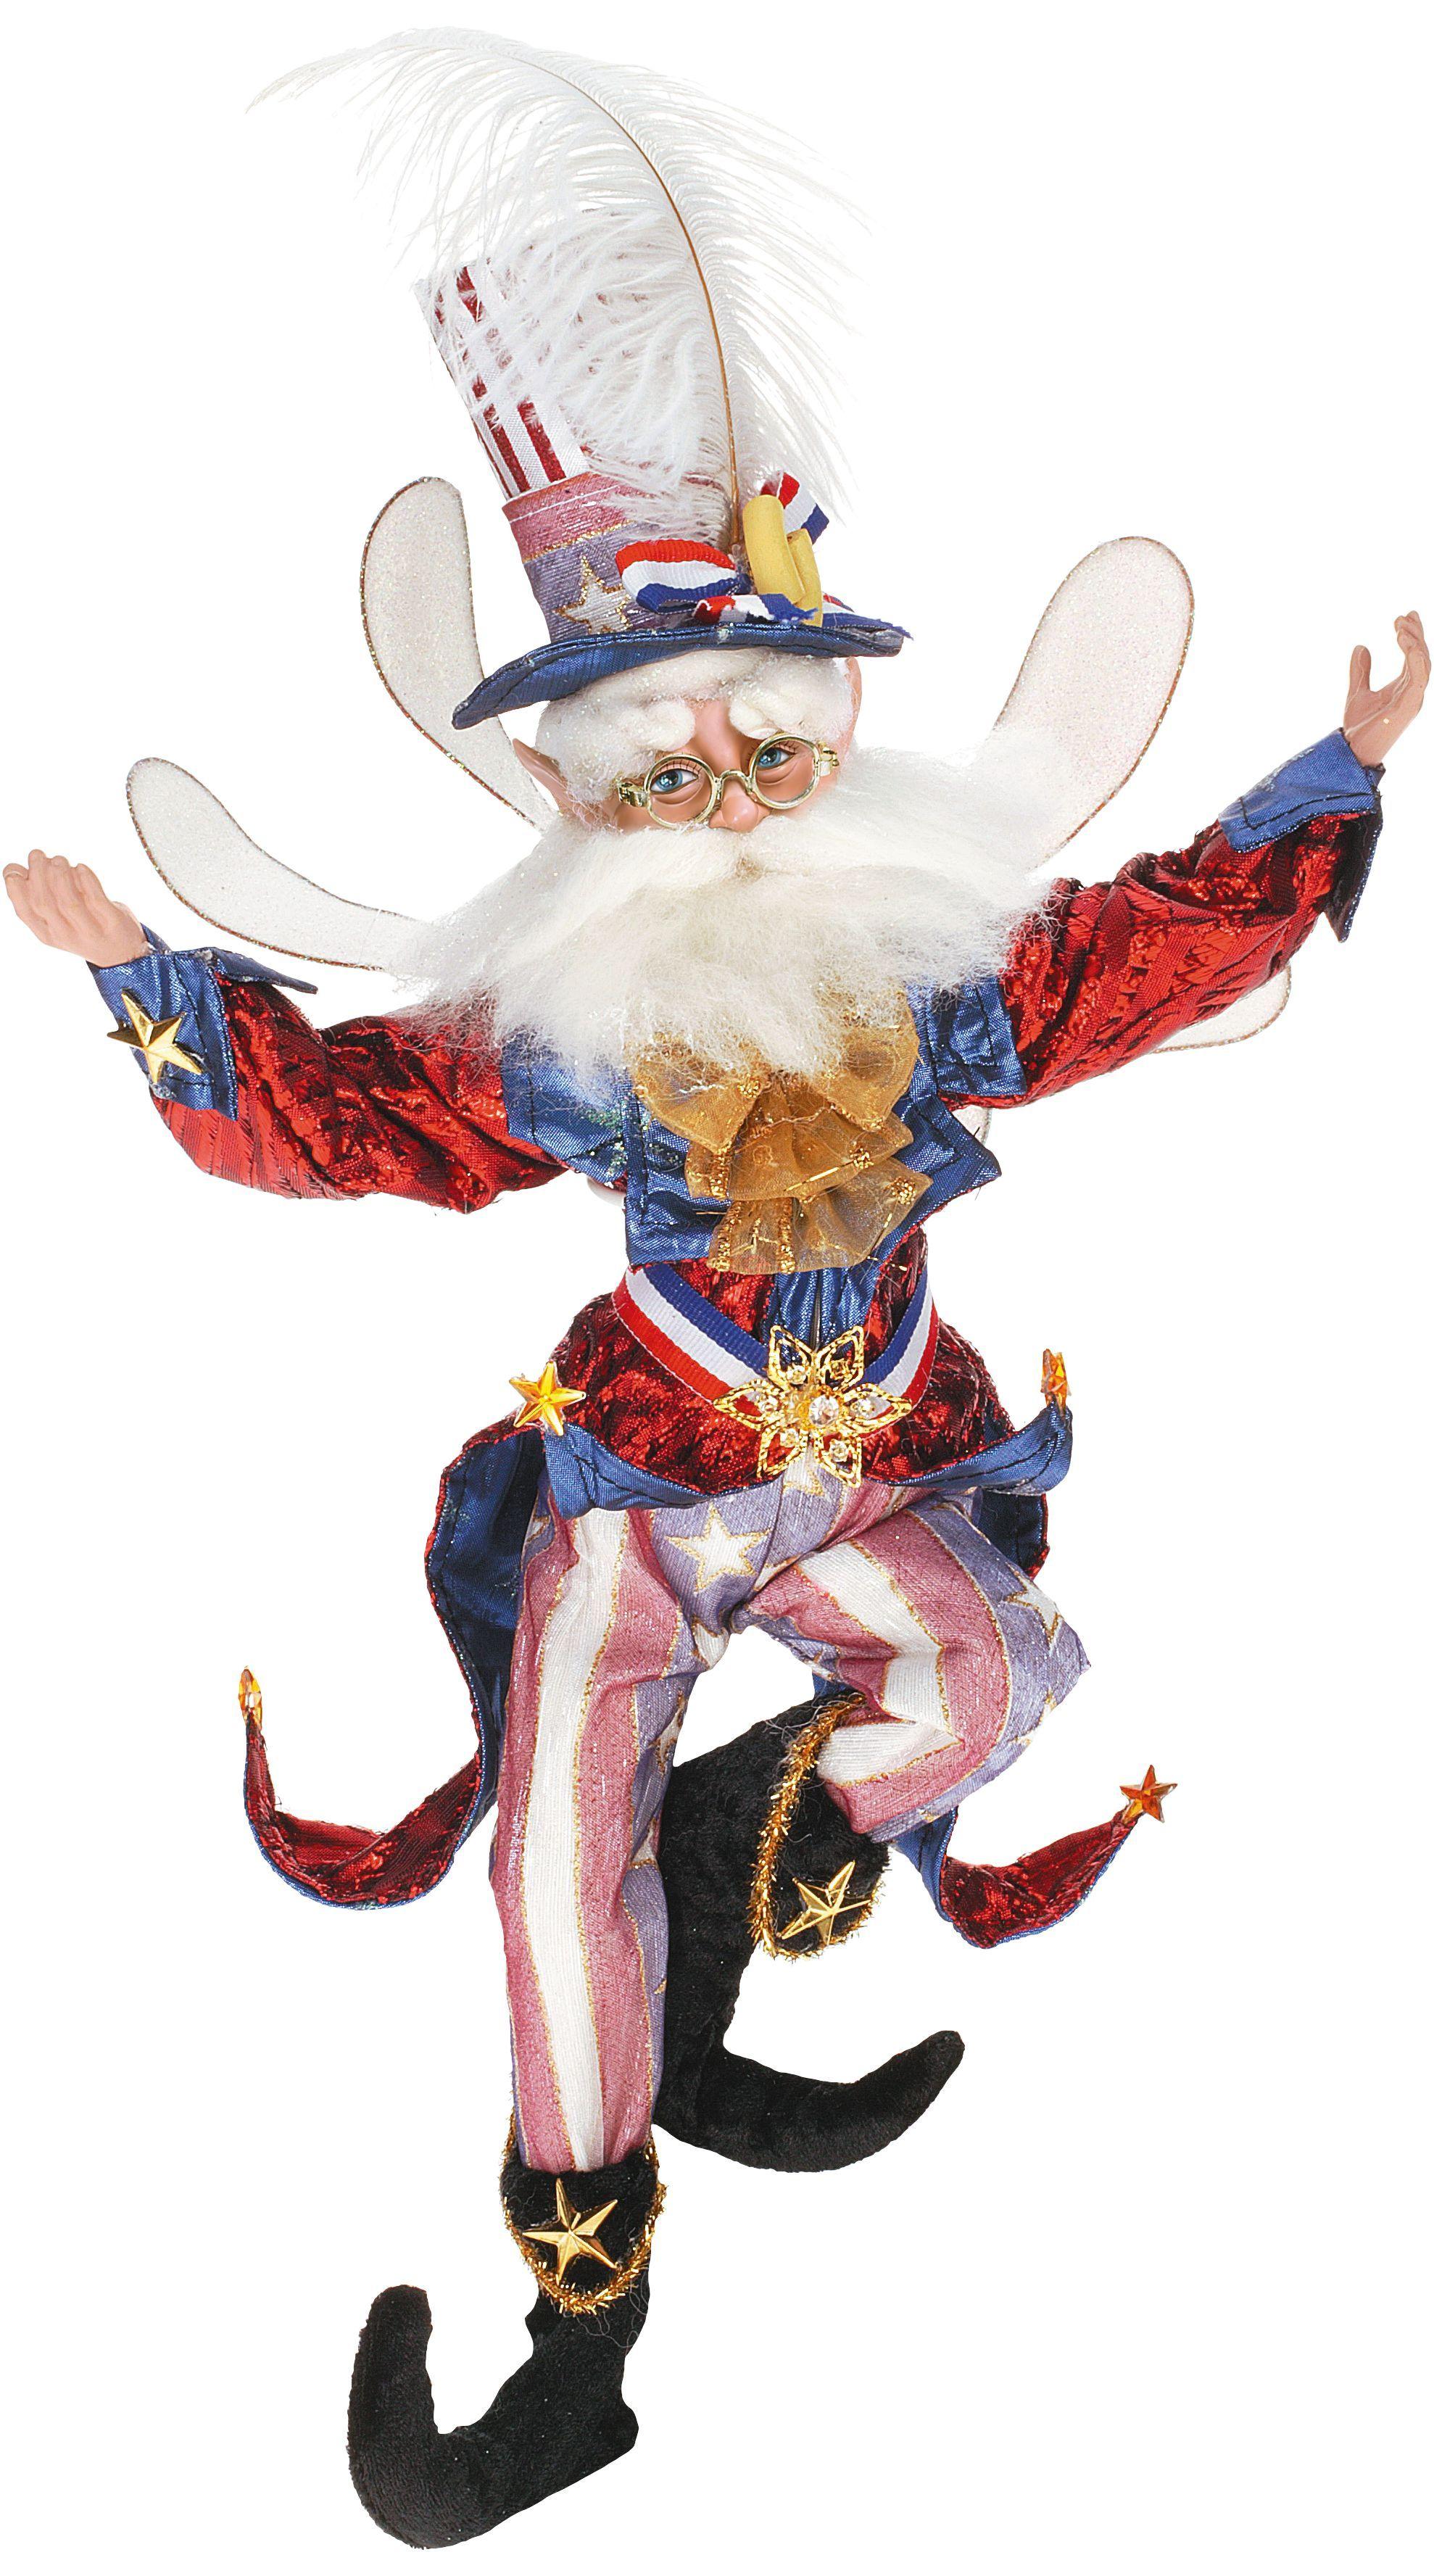 mark roberts fairies | Noel Christmas Store has Mark Roberts Spring ...